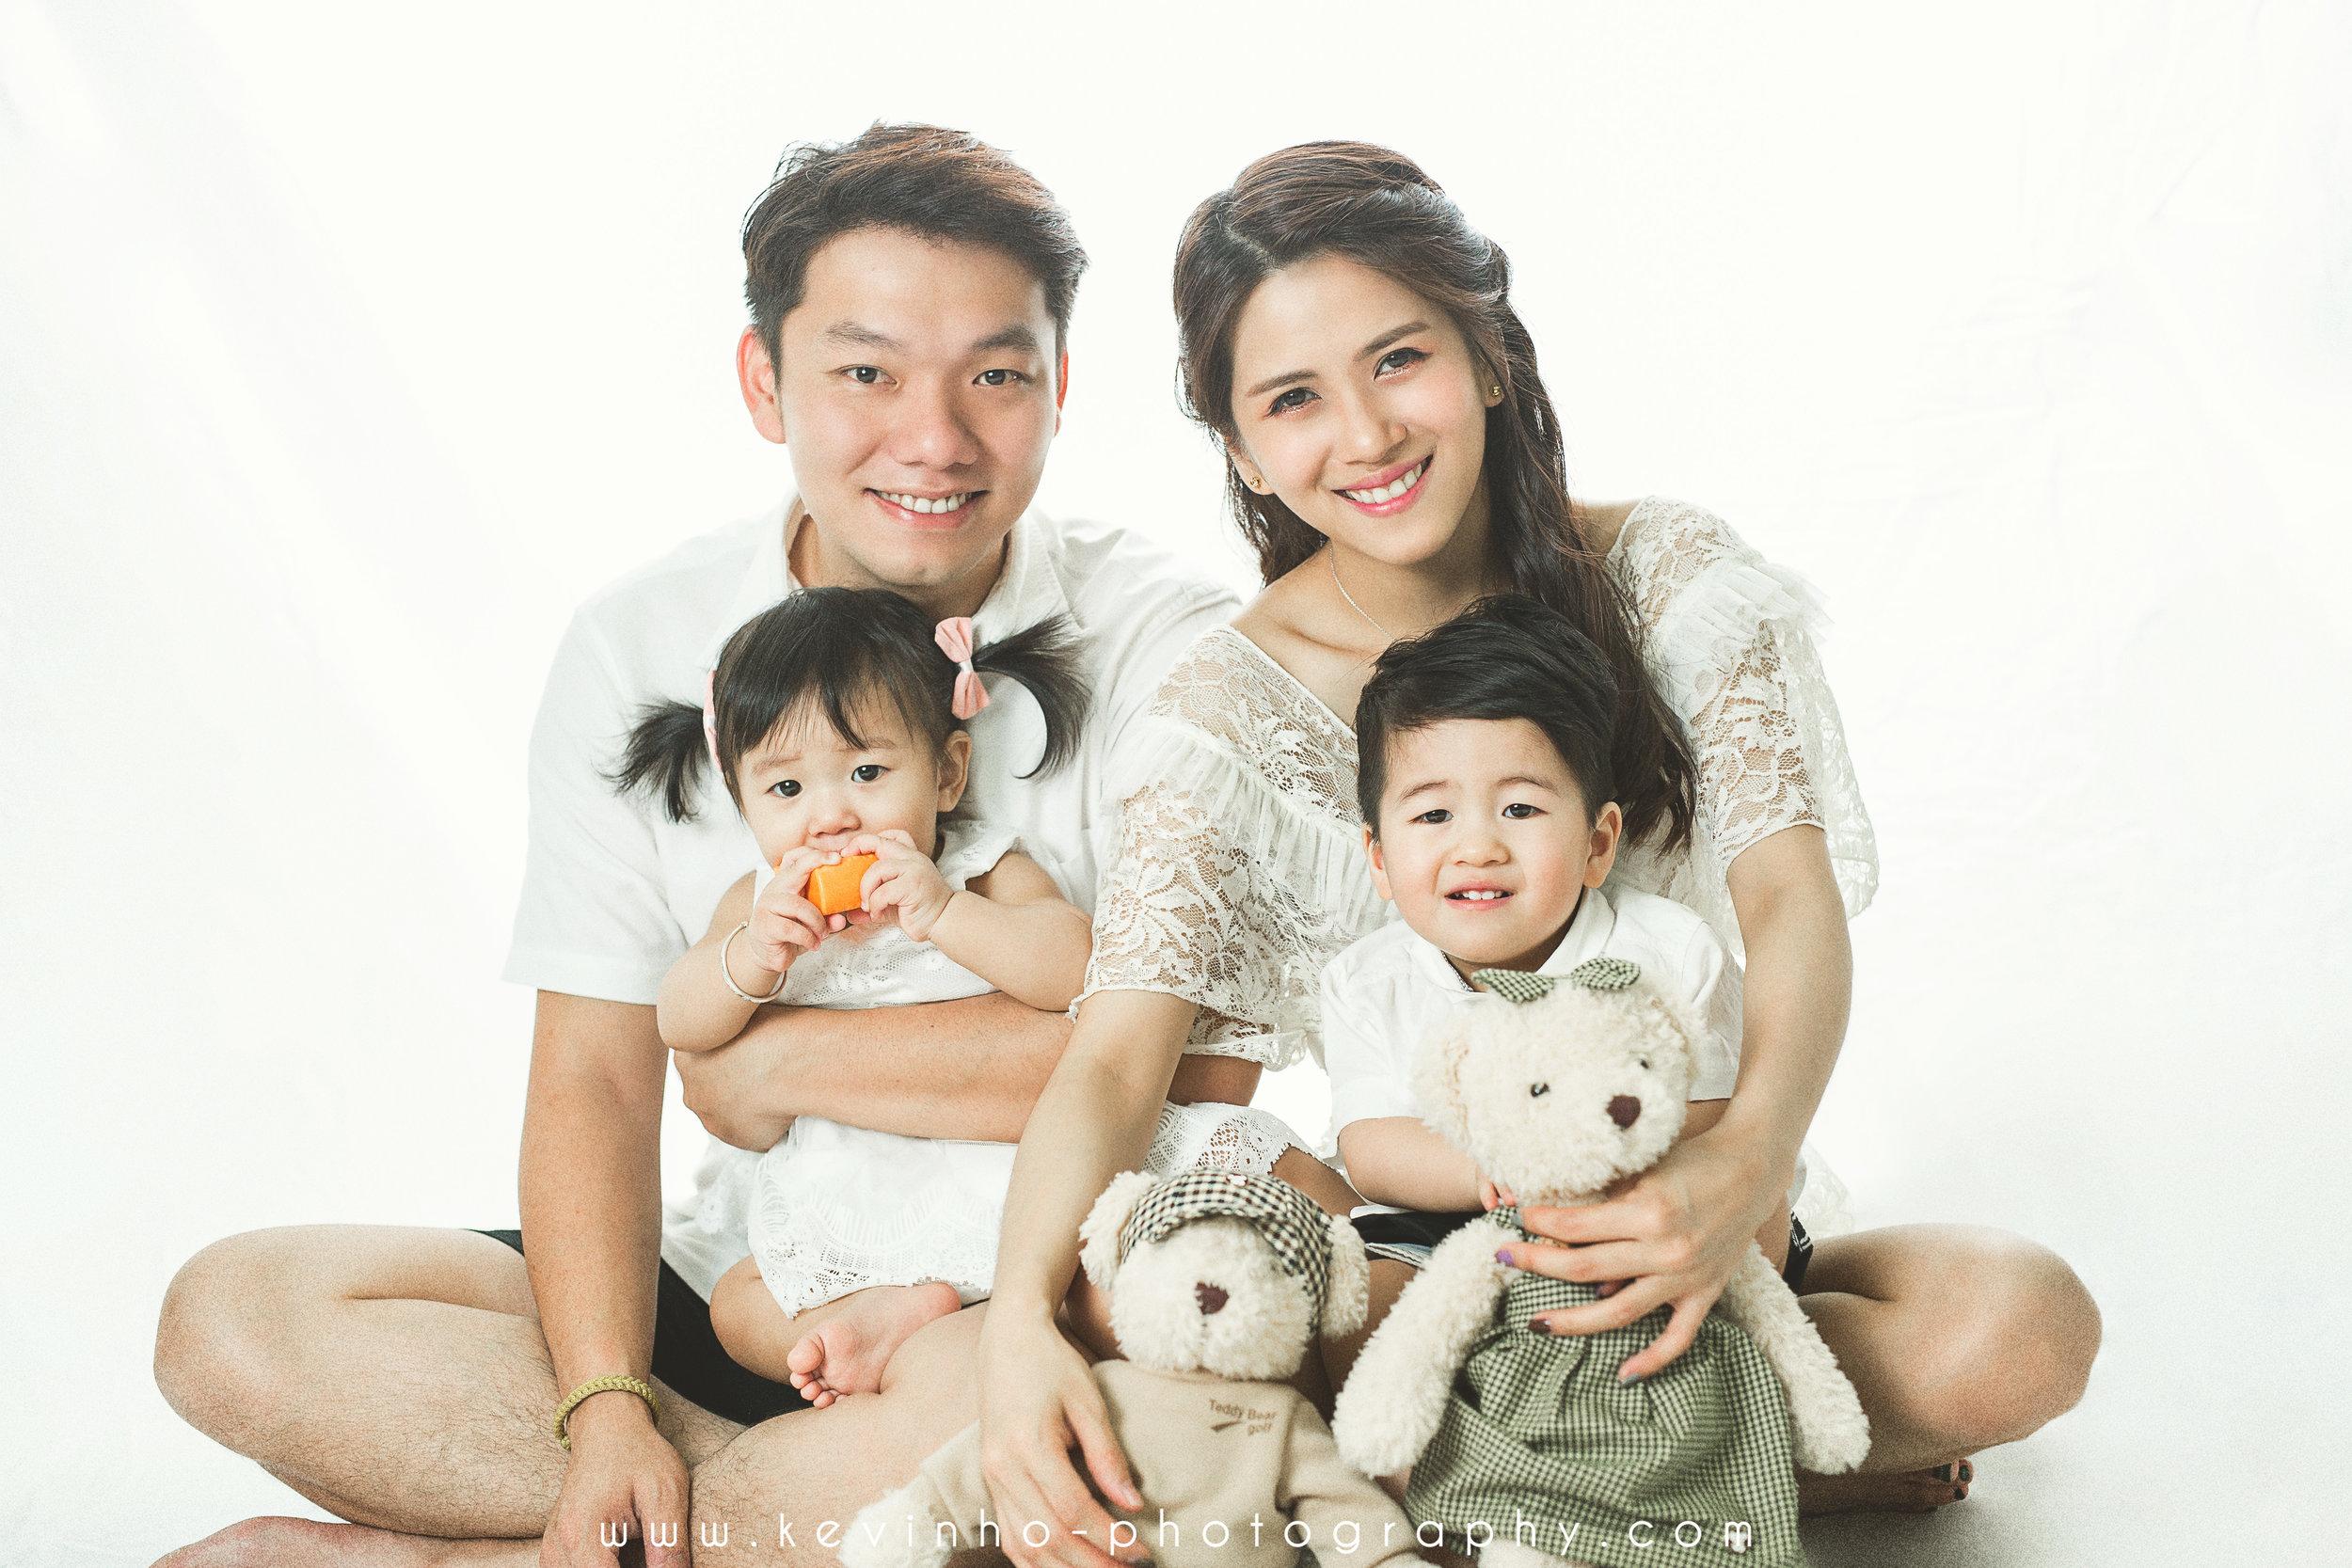 Portraits - Maternity, Family, Corporate, Portfolio, etc